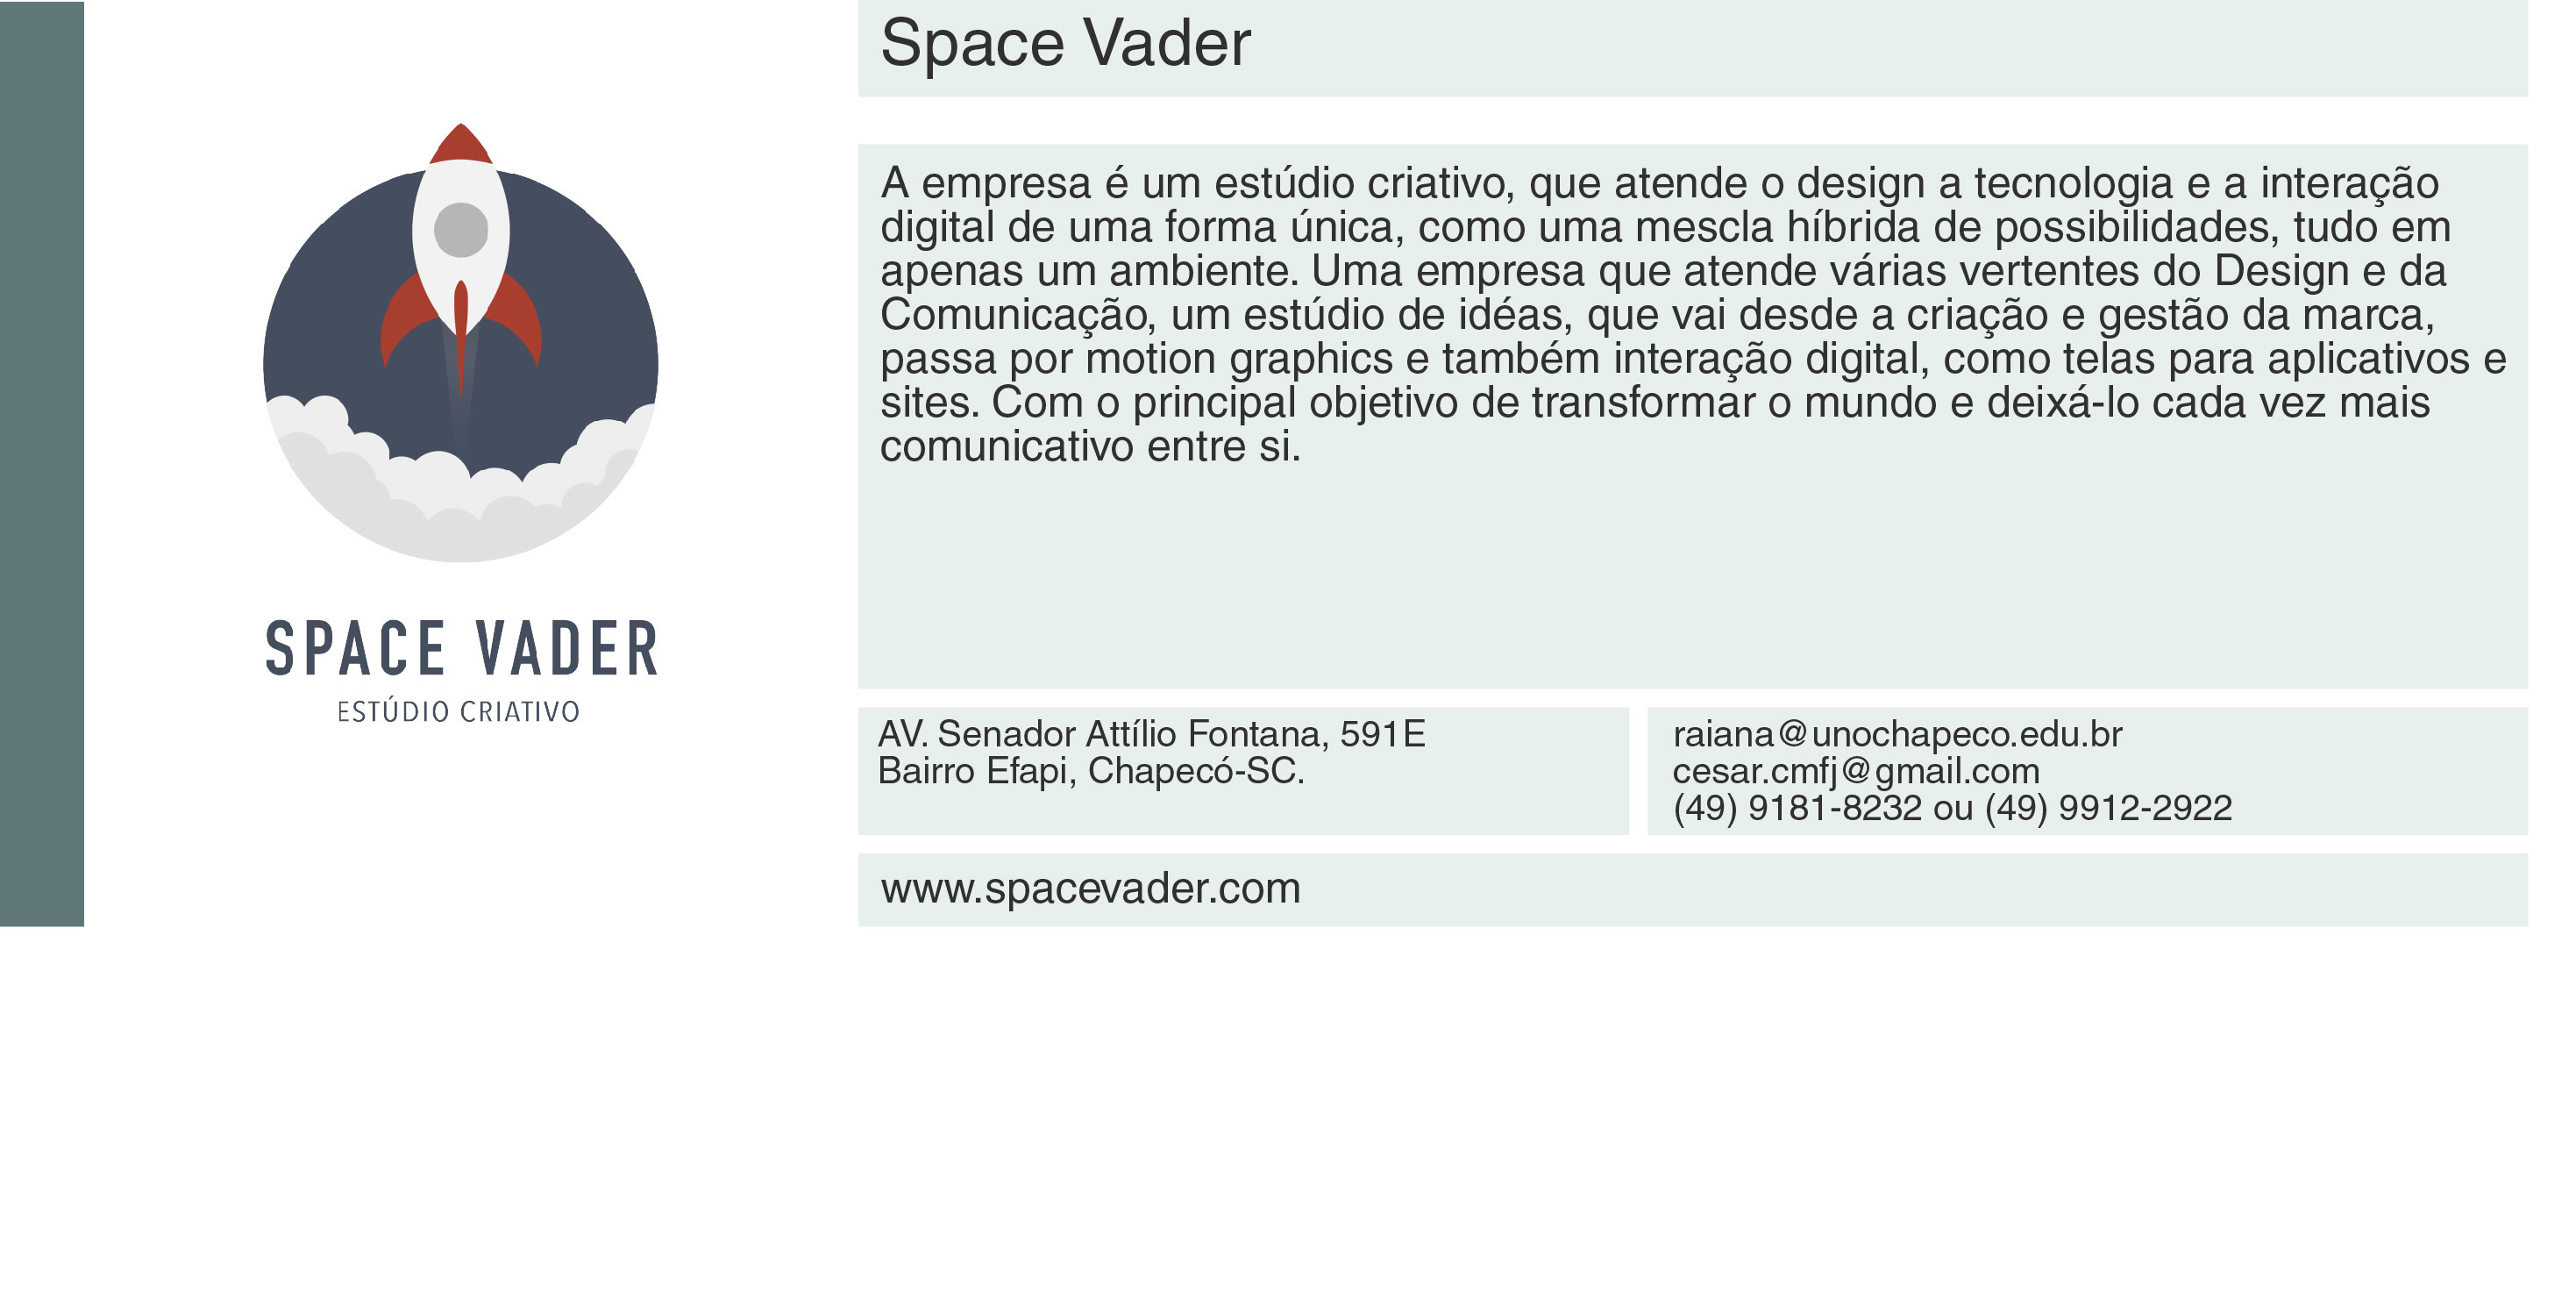 space vader